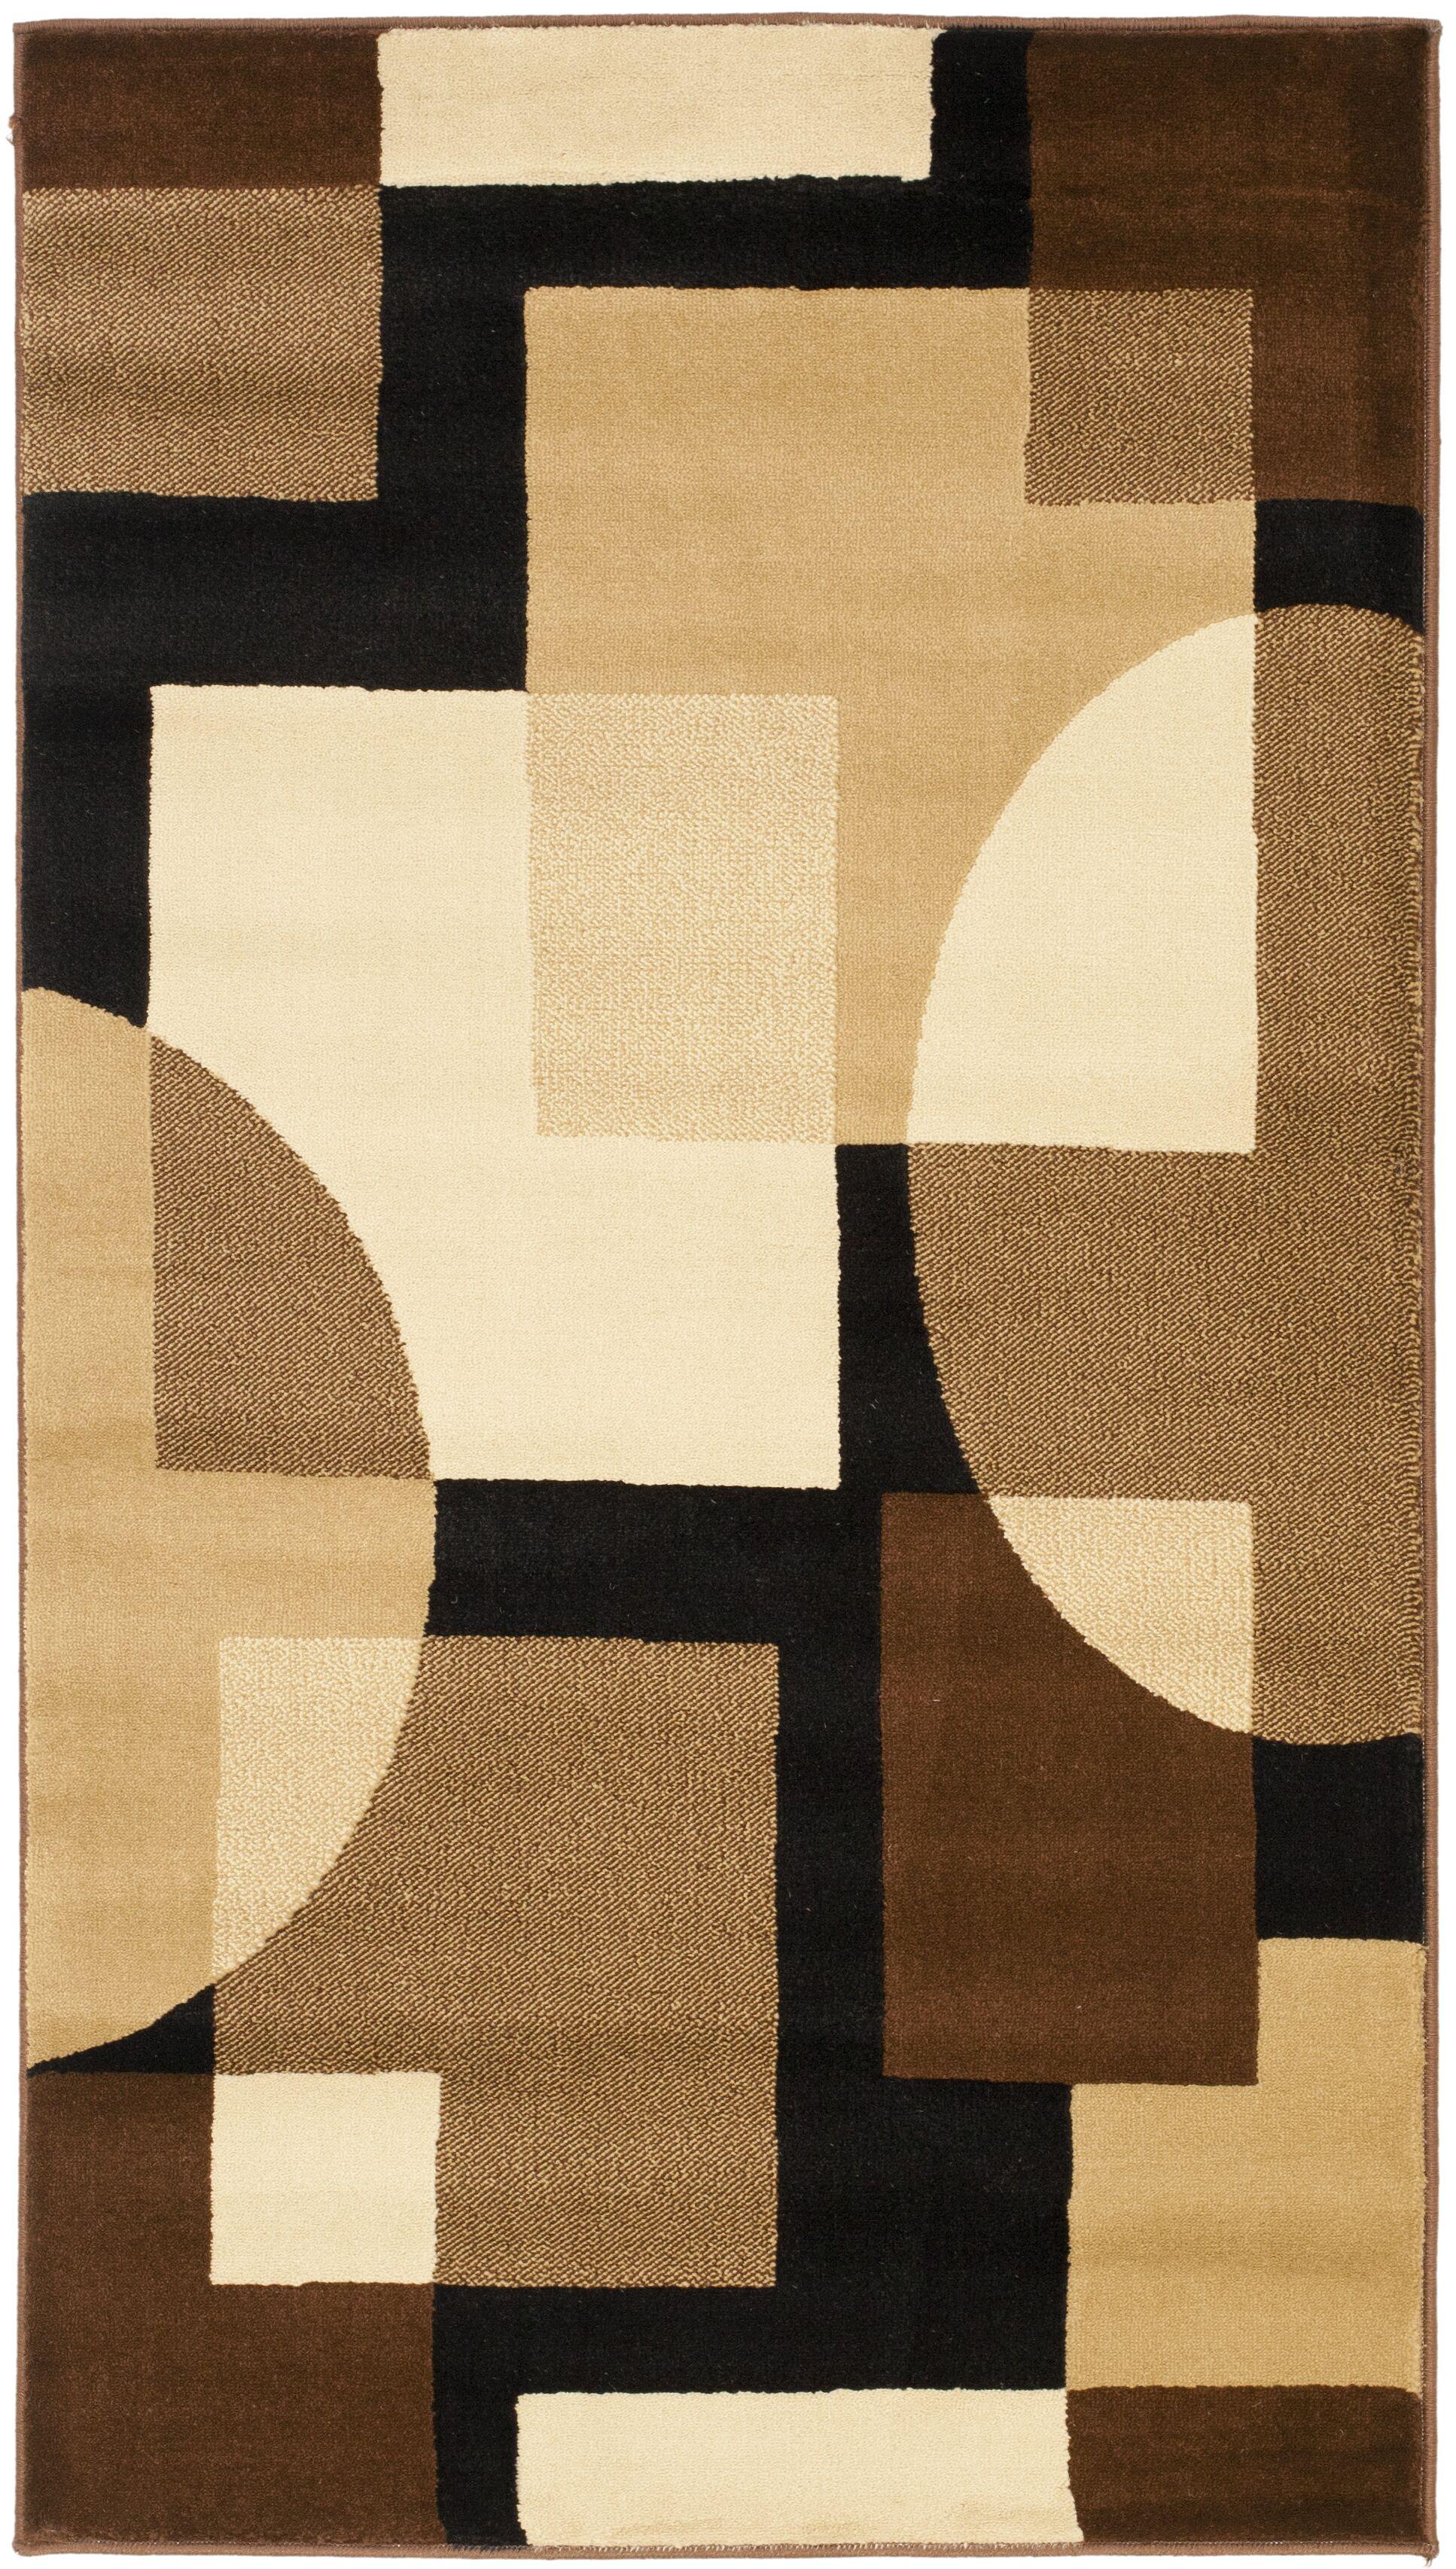 Charis Brown Geometric Area Rug Rug Size: Rectangle 5'3